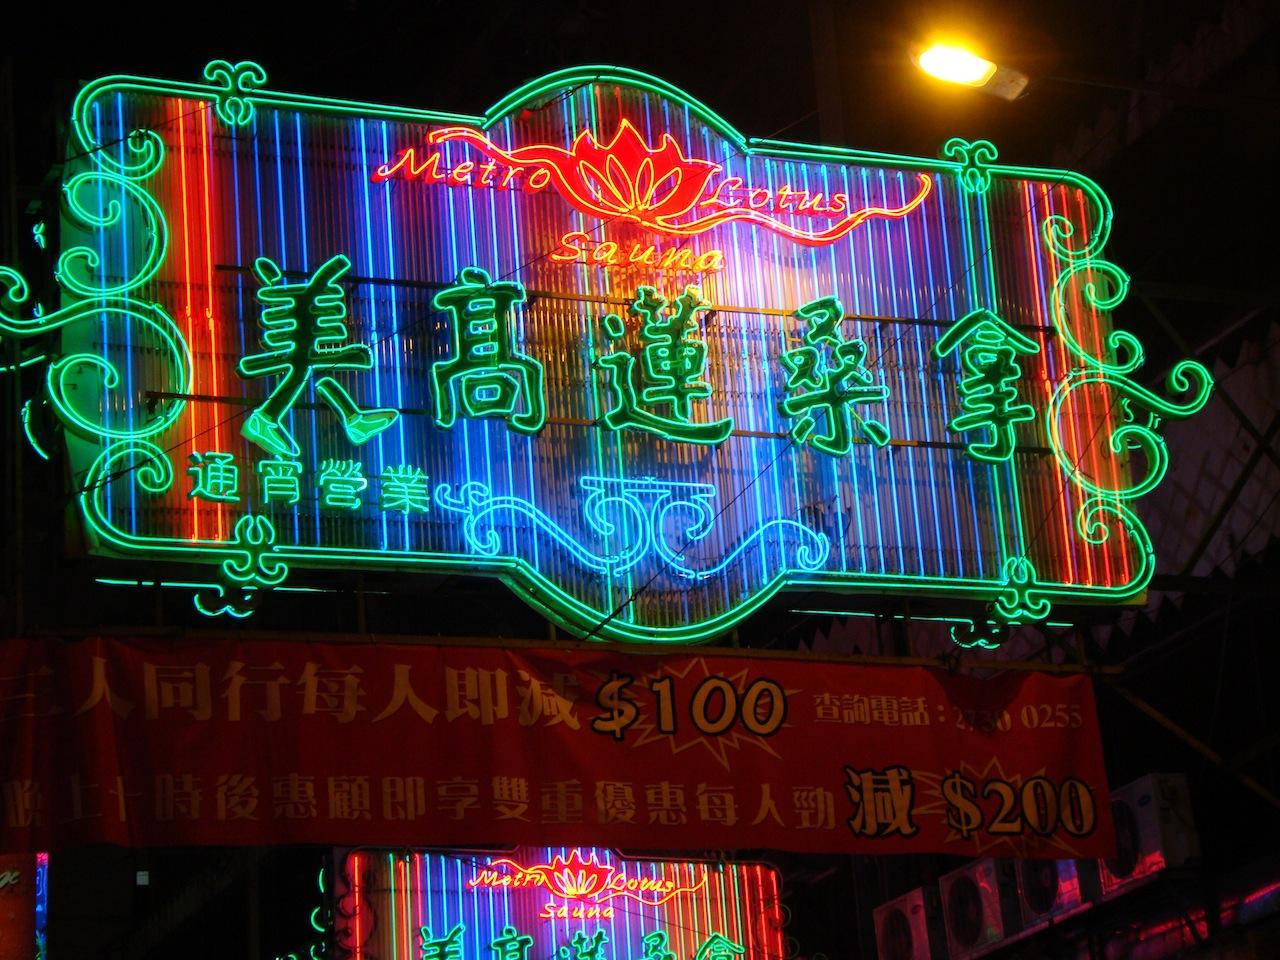 Metro Lotus Sauna sign (photograph by Vasenka Photography, via Flickr)